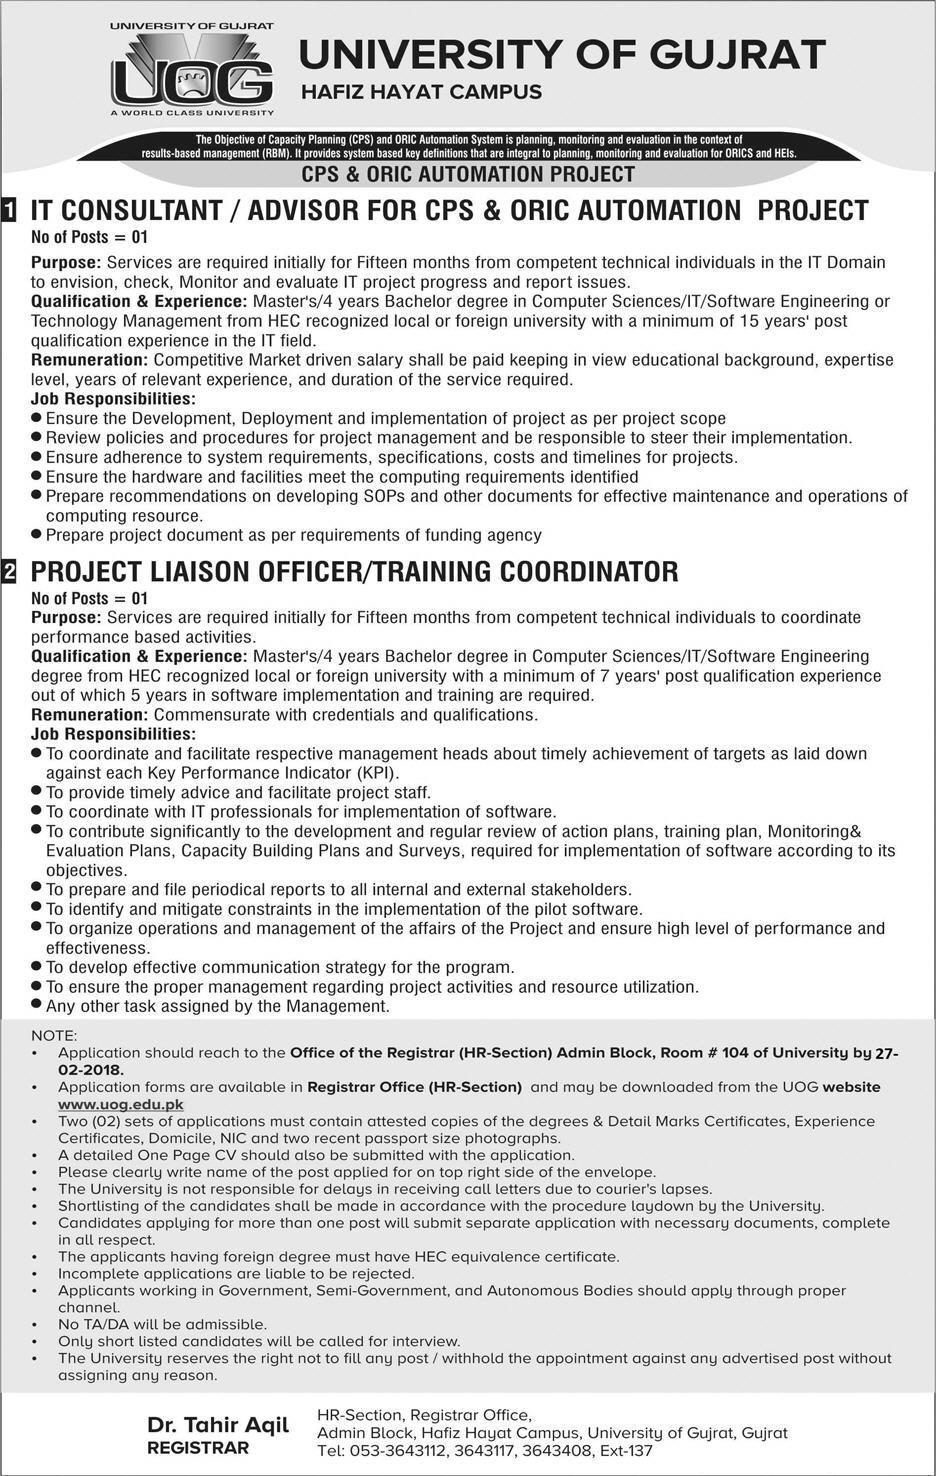 IT Consultants / Advisors Job in  University of Gujrat UOG